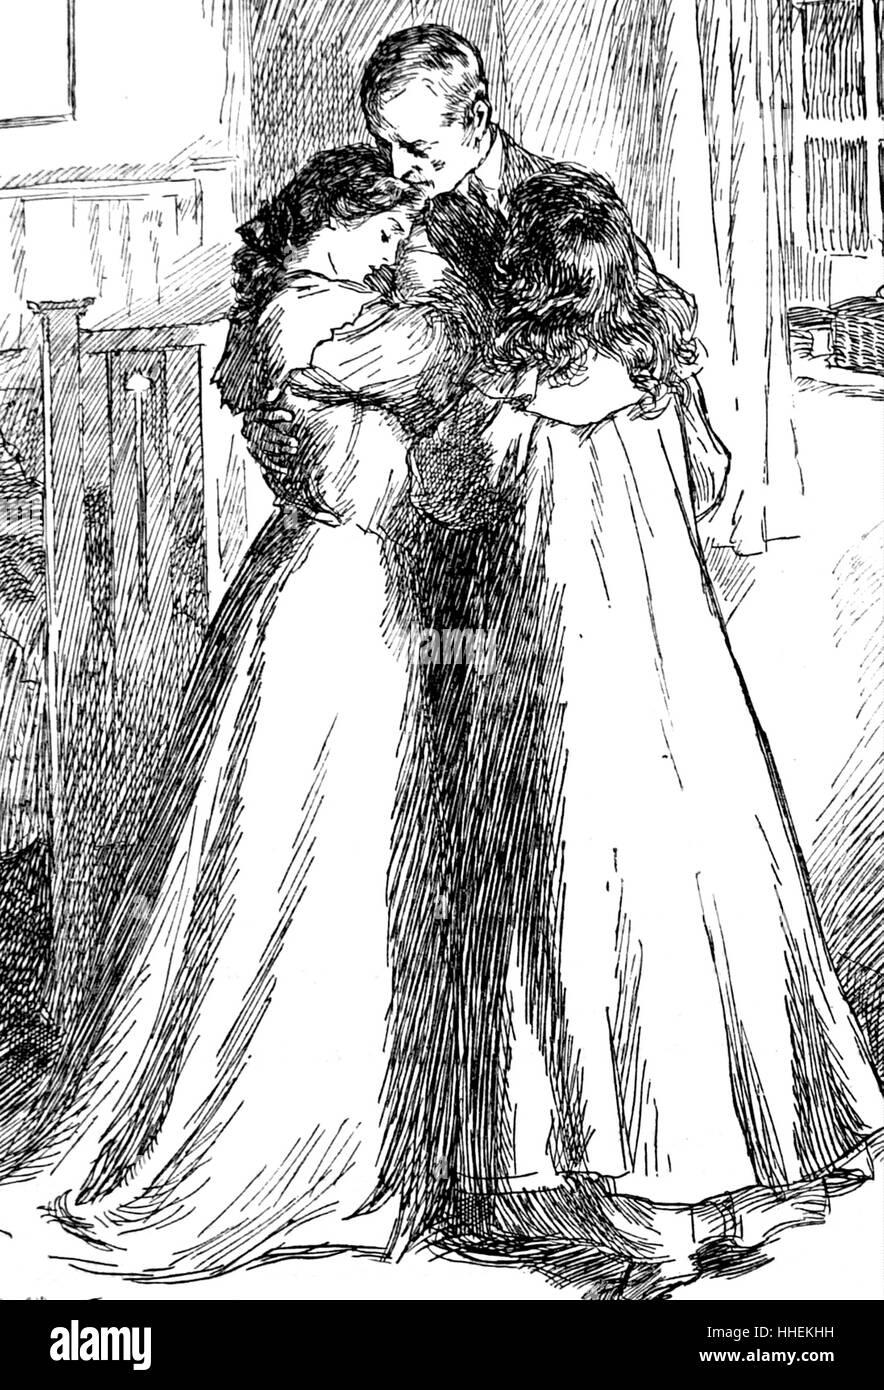 Illustration by Fred Pegram - Stock Image